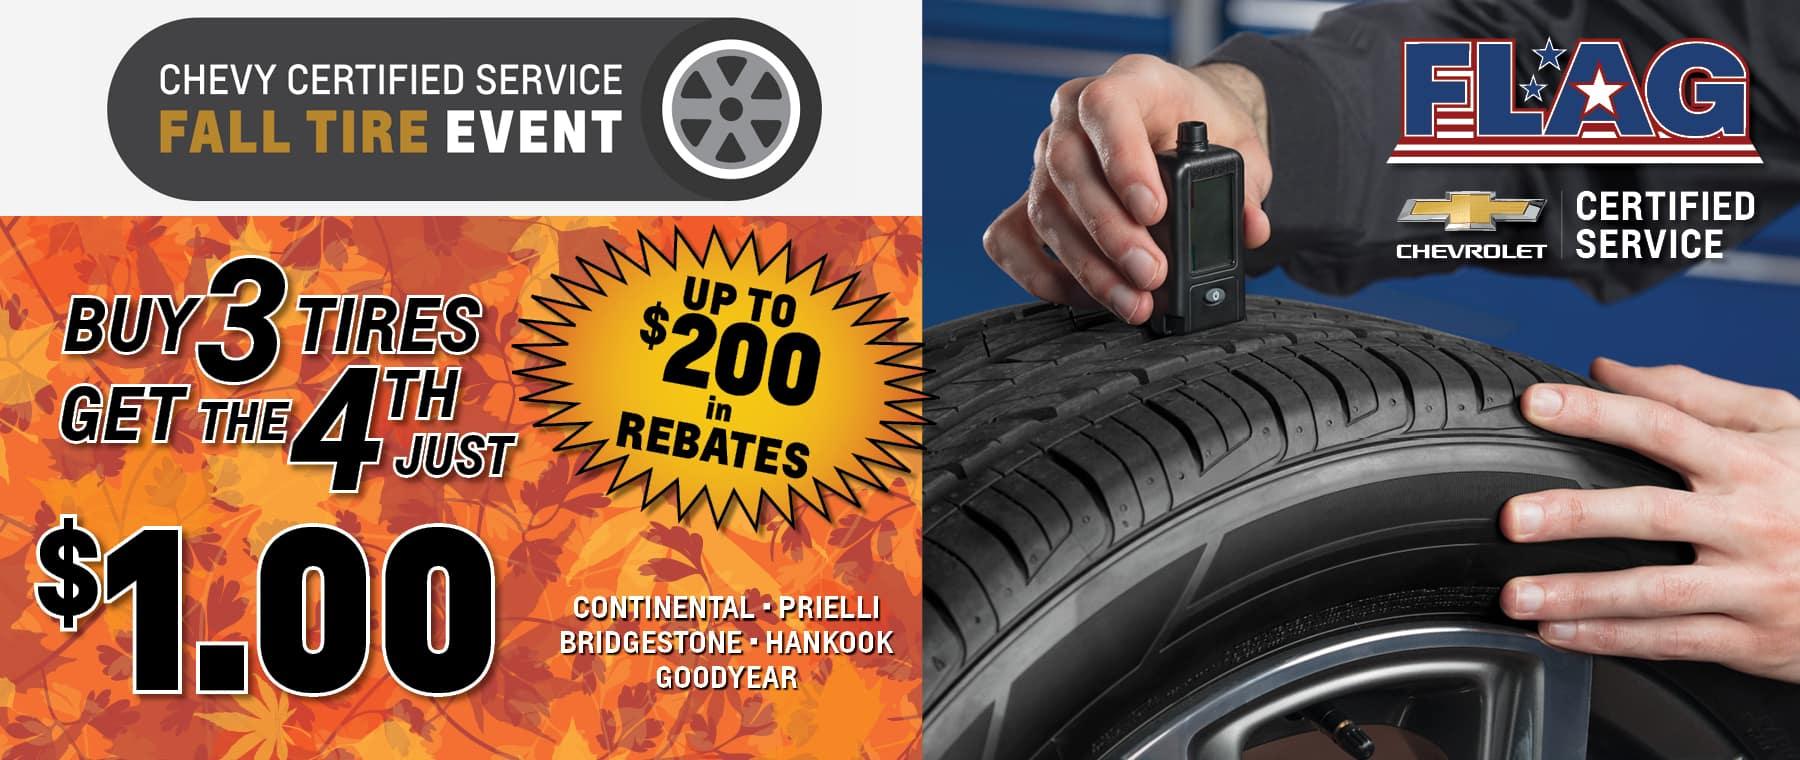 tire service event